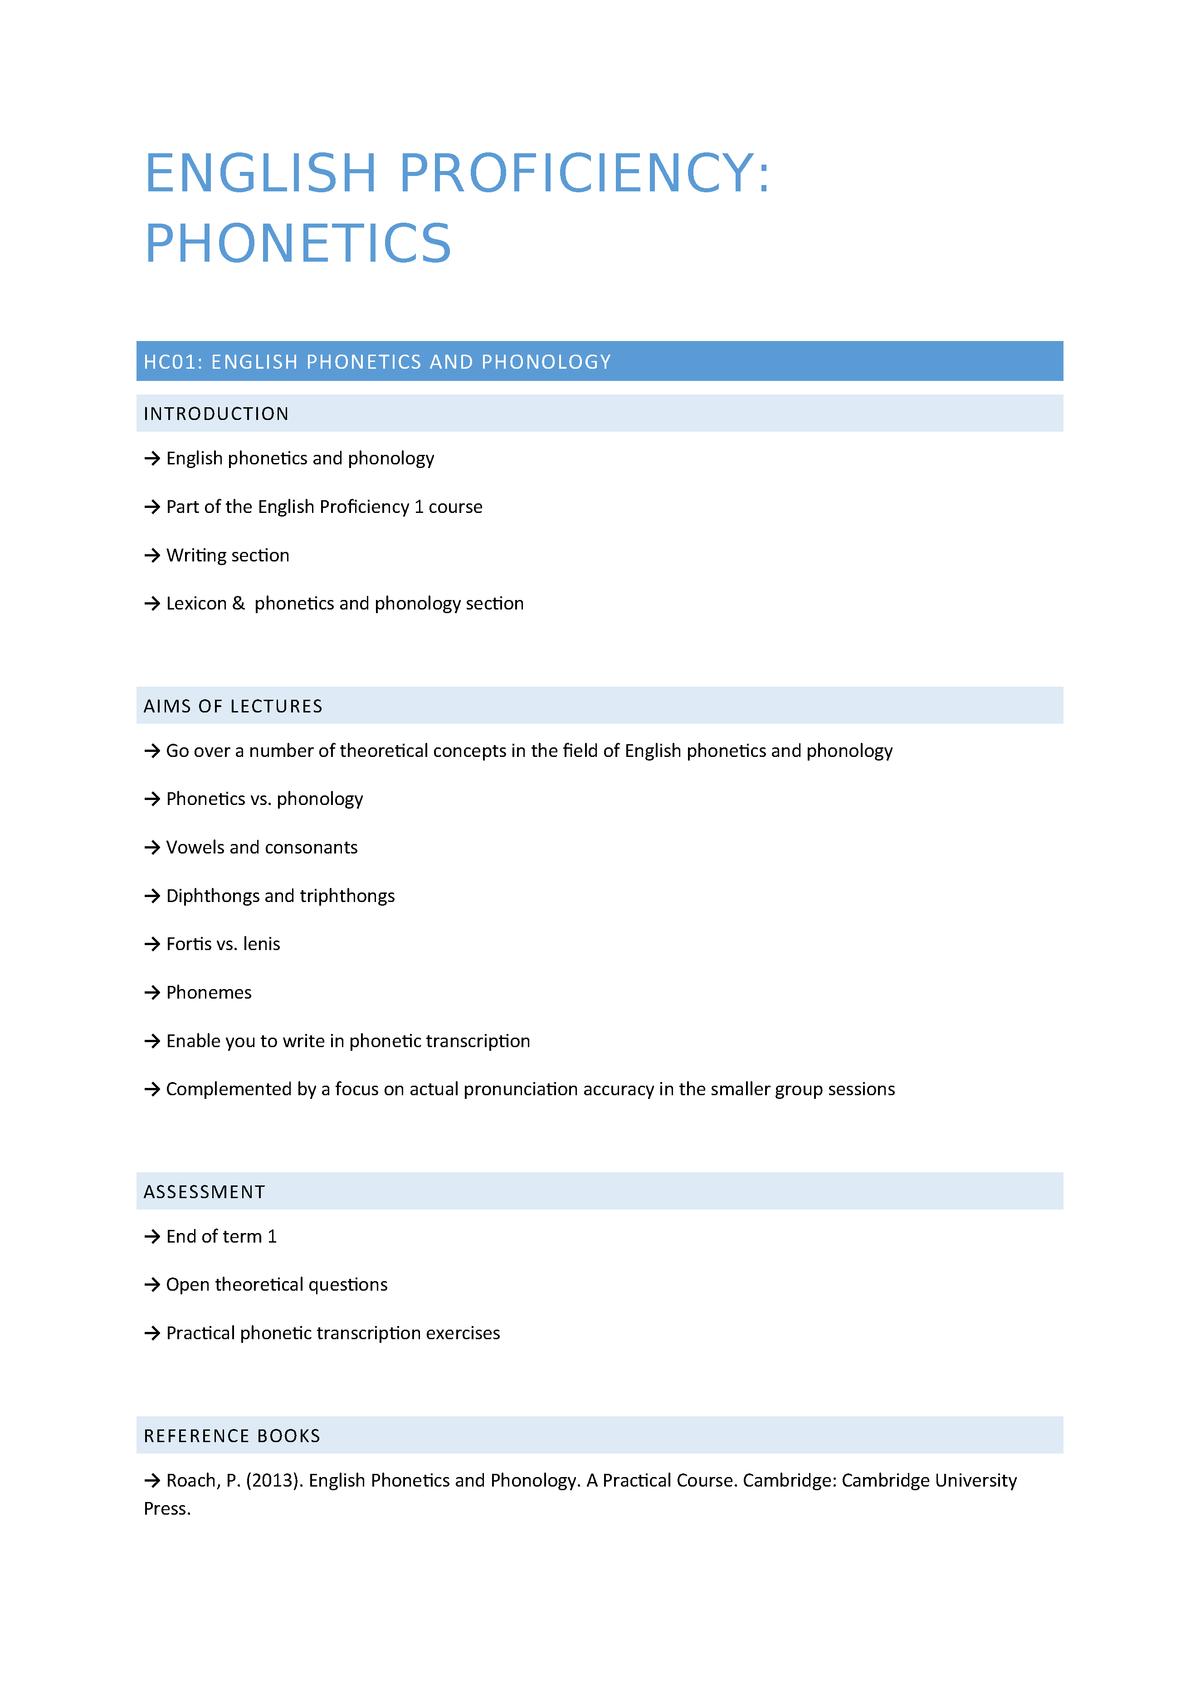 Summary - Phonetics - English proficiency 1 - StuDocu